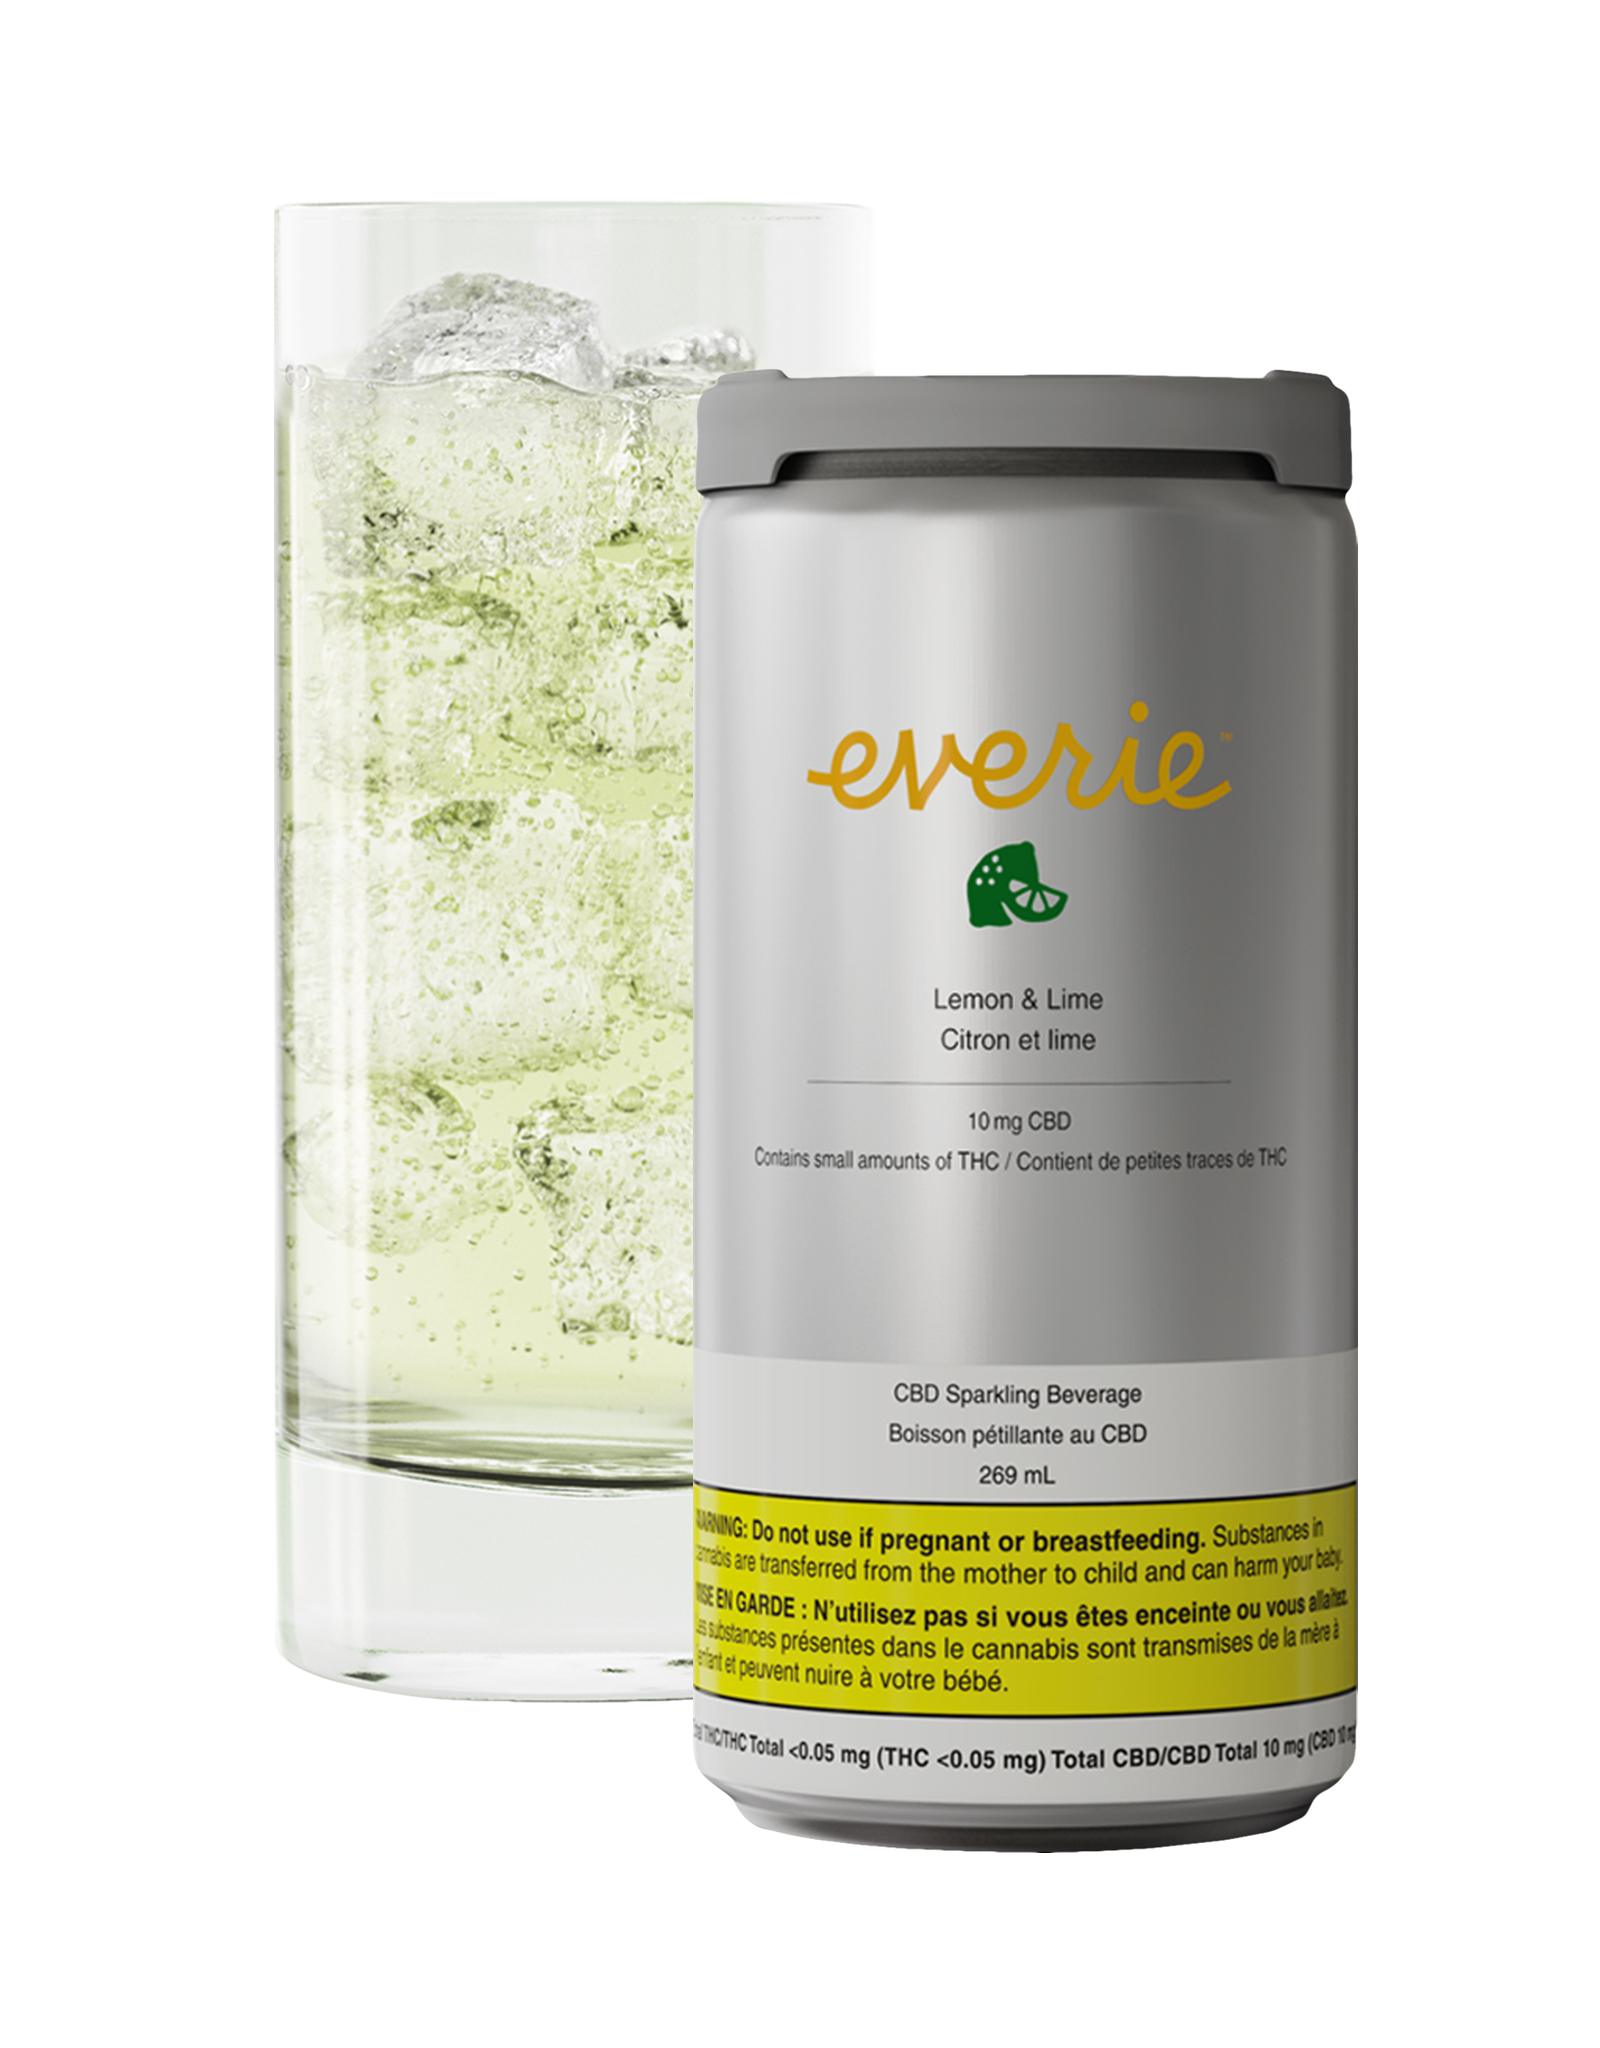 Everie Everie - Lemon & Lime CBD Sparkling Water